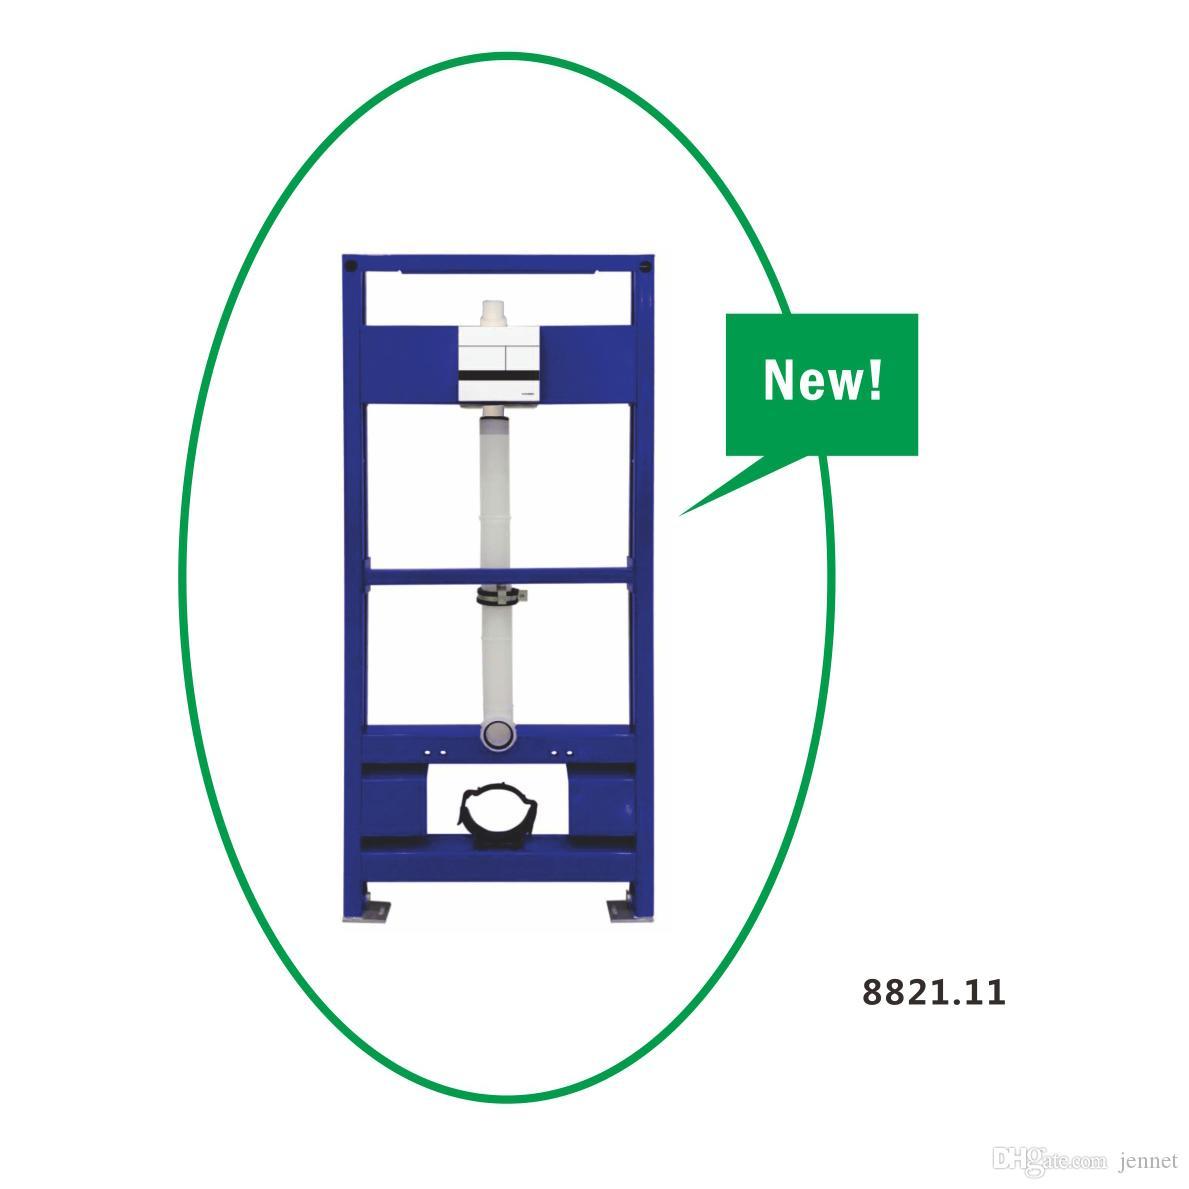 Auto Flush verdeckter System für Wand hungtoilet Pfannenboden montierten WC Doppel Spültoilette Sensor Spülsystem Urinal hock